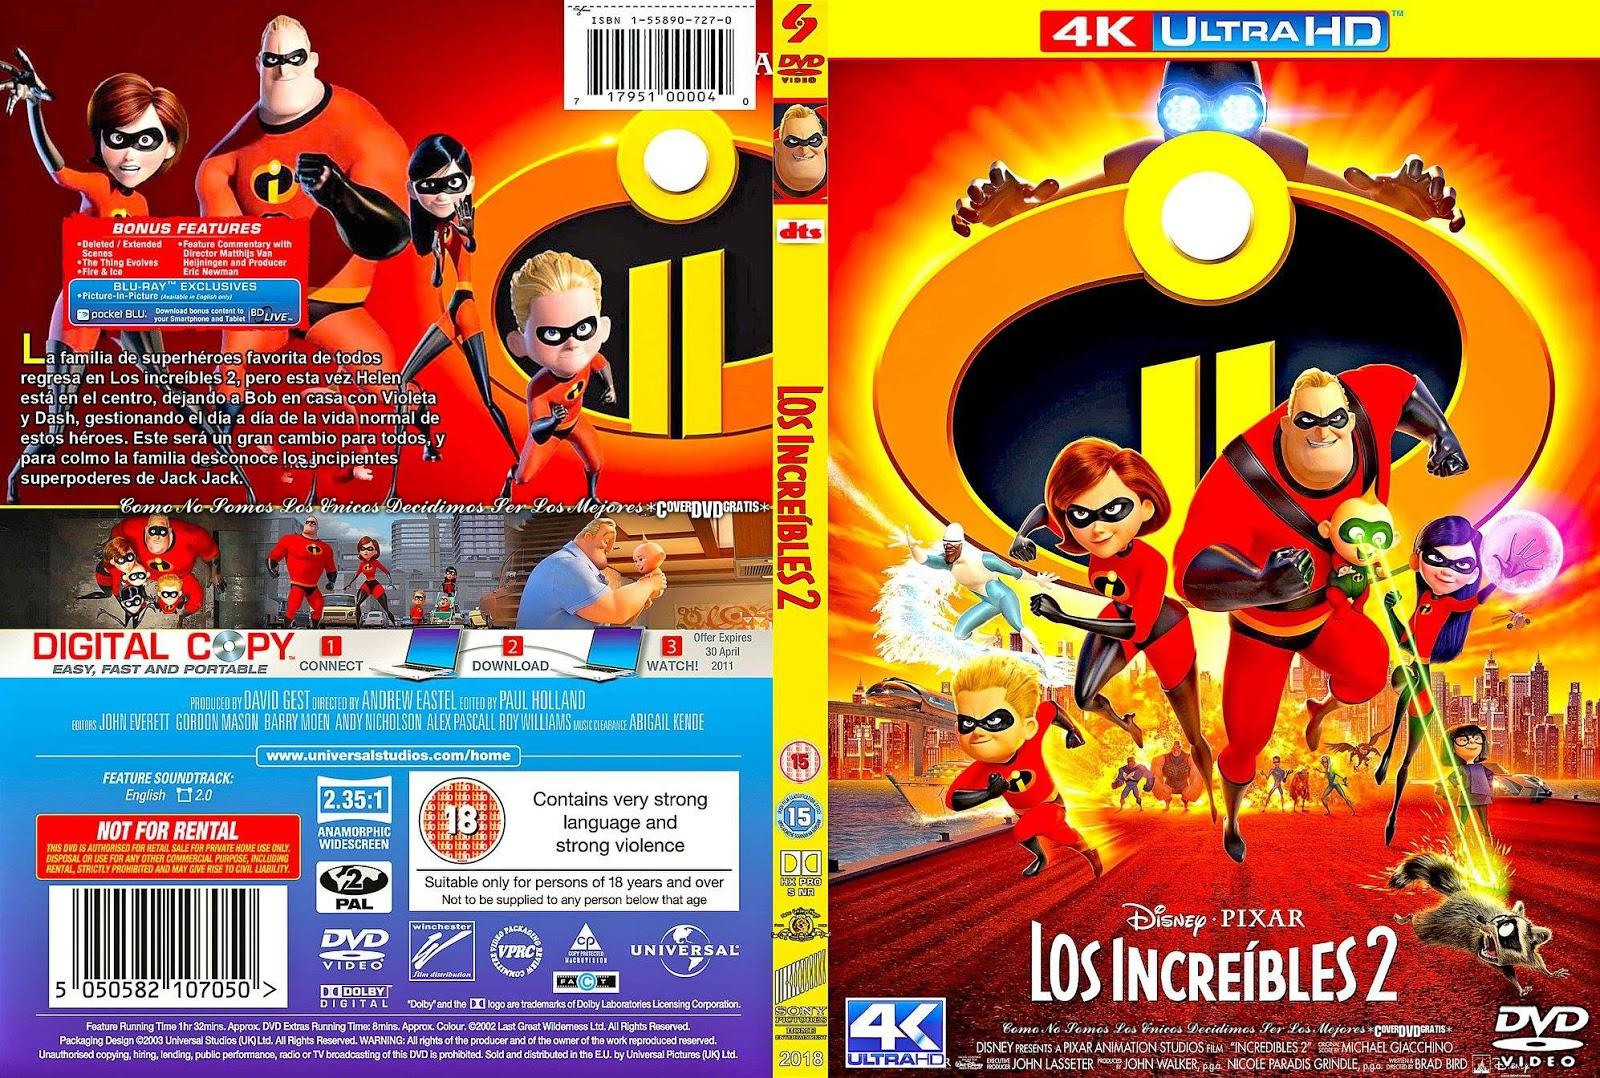 Los Incredibles 2 (2018) DVDrip Latino | Teconseguimosellink